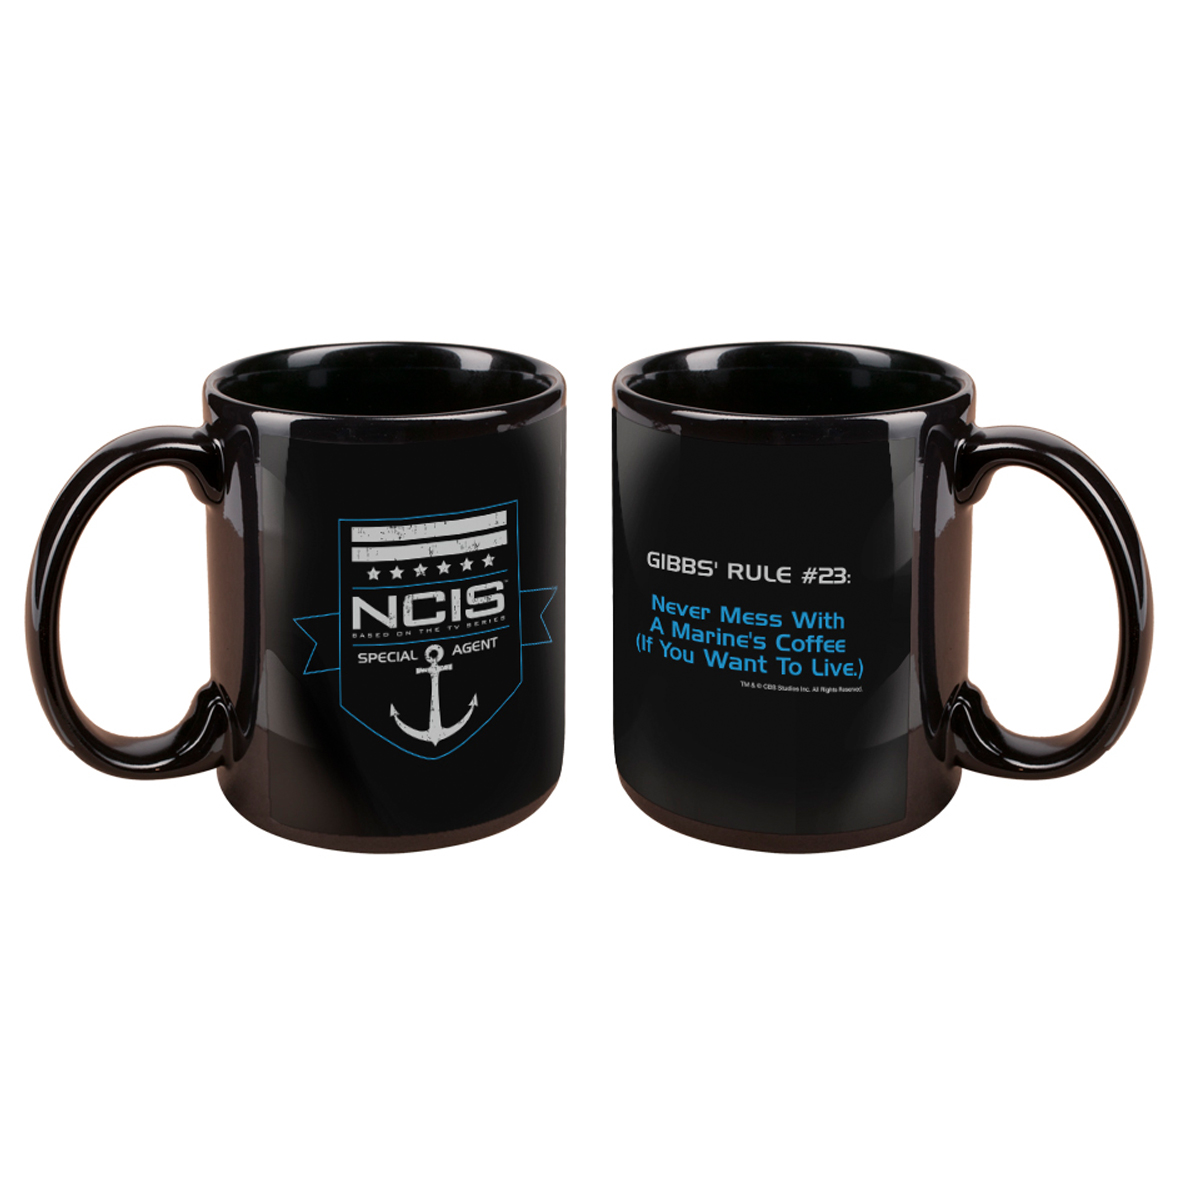 NCIS Special Agent Gibbs' Rule 23 Mug